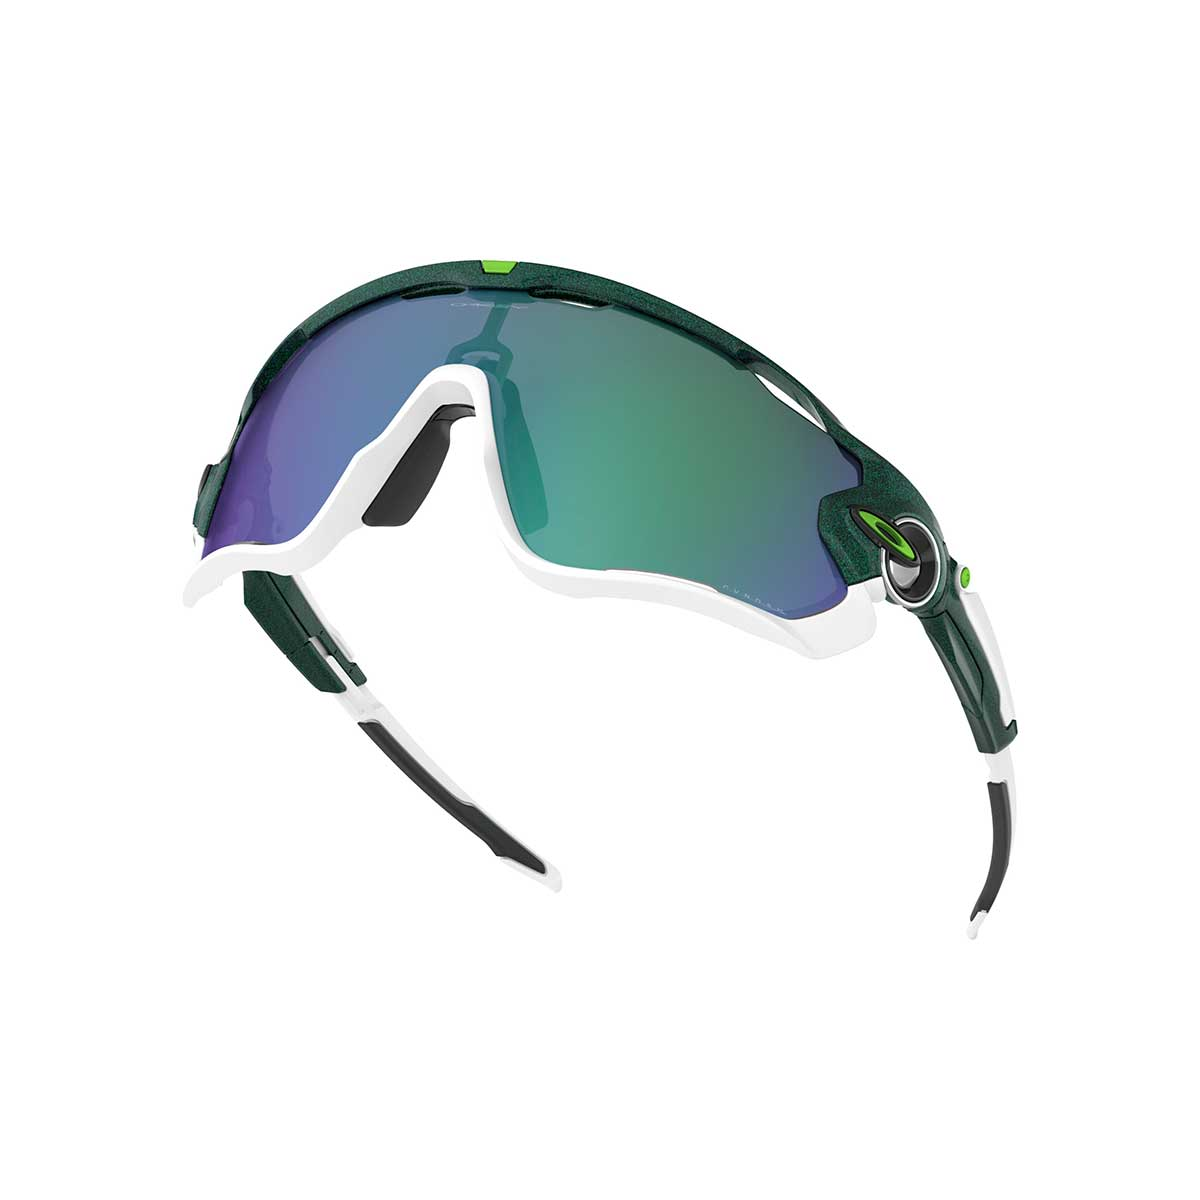 Óculos Oakley JawBreaker - Edição Especial Mark Cavendish